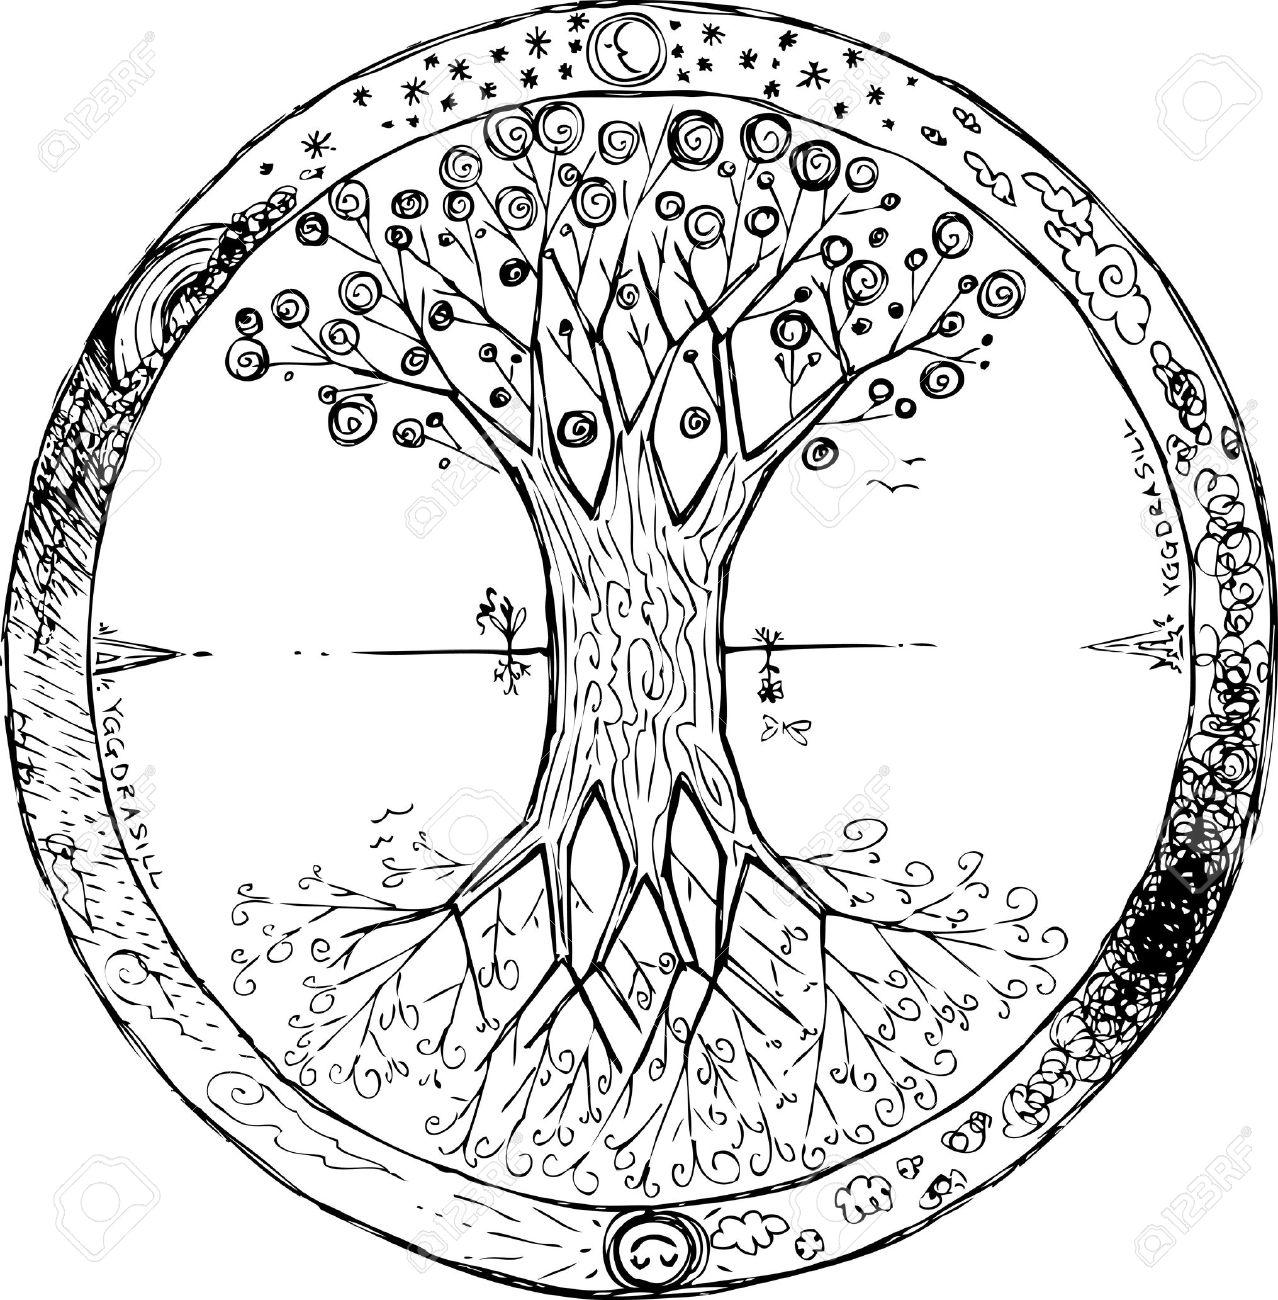 Yggdrasil celtic tree of life mandala Stock Vector - 18526856